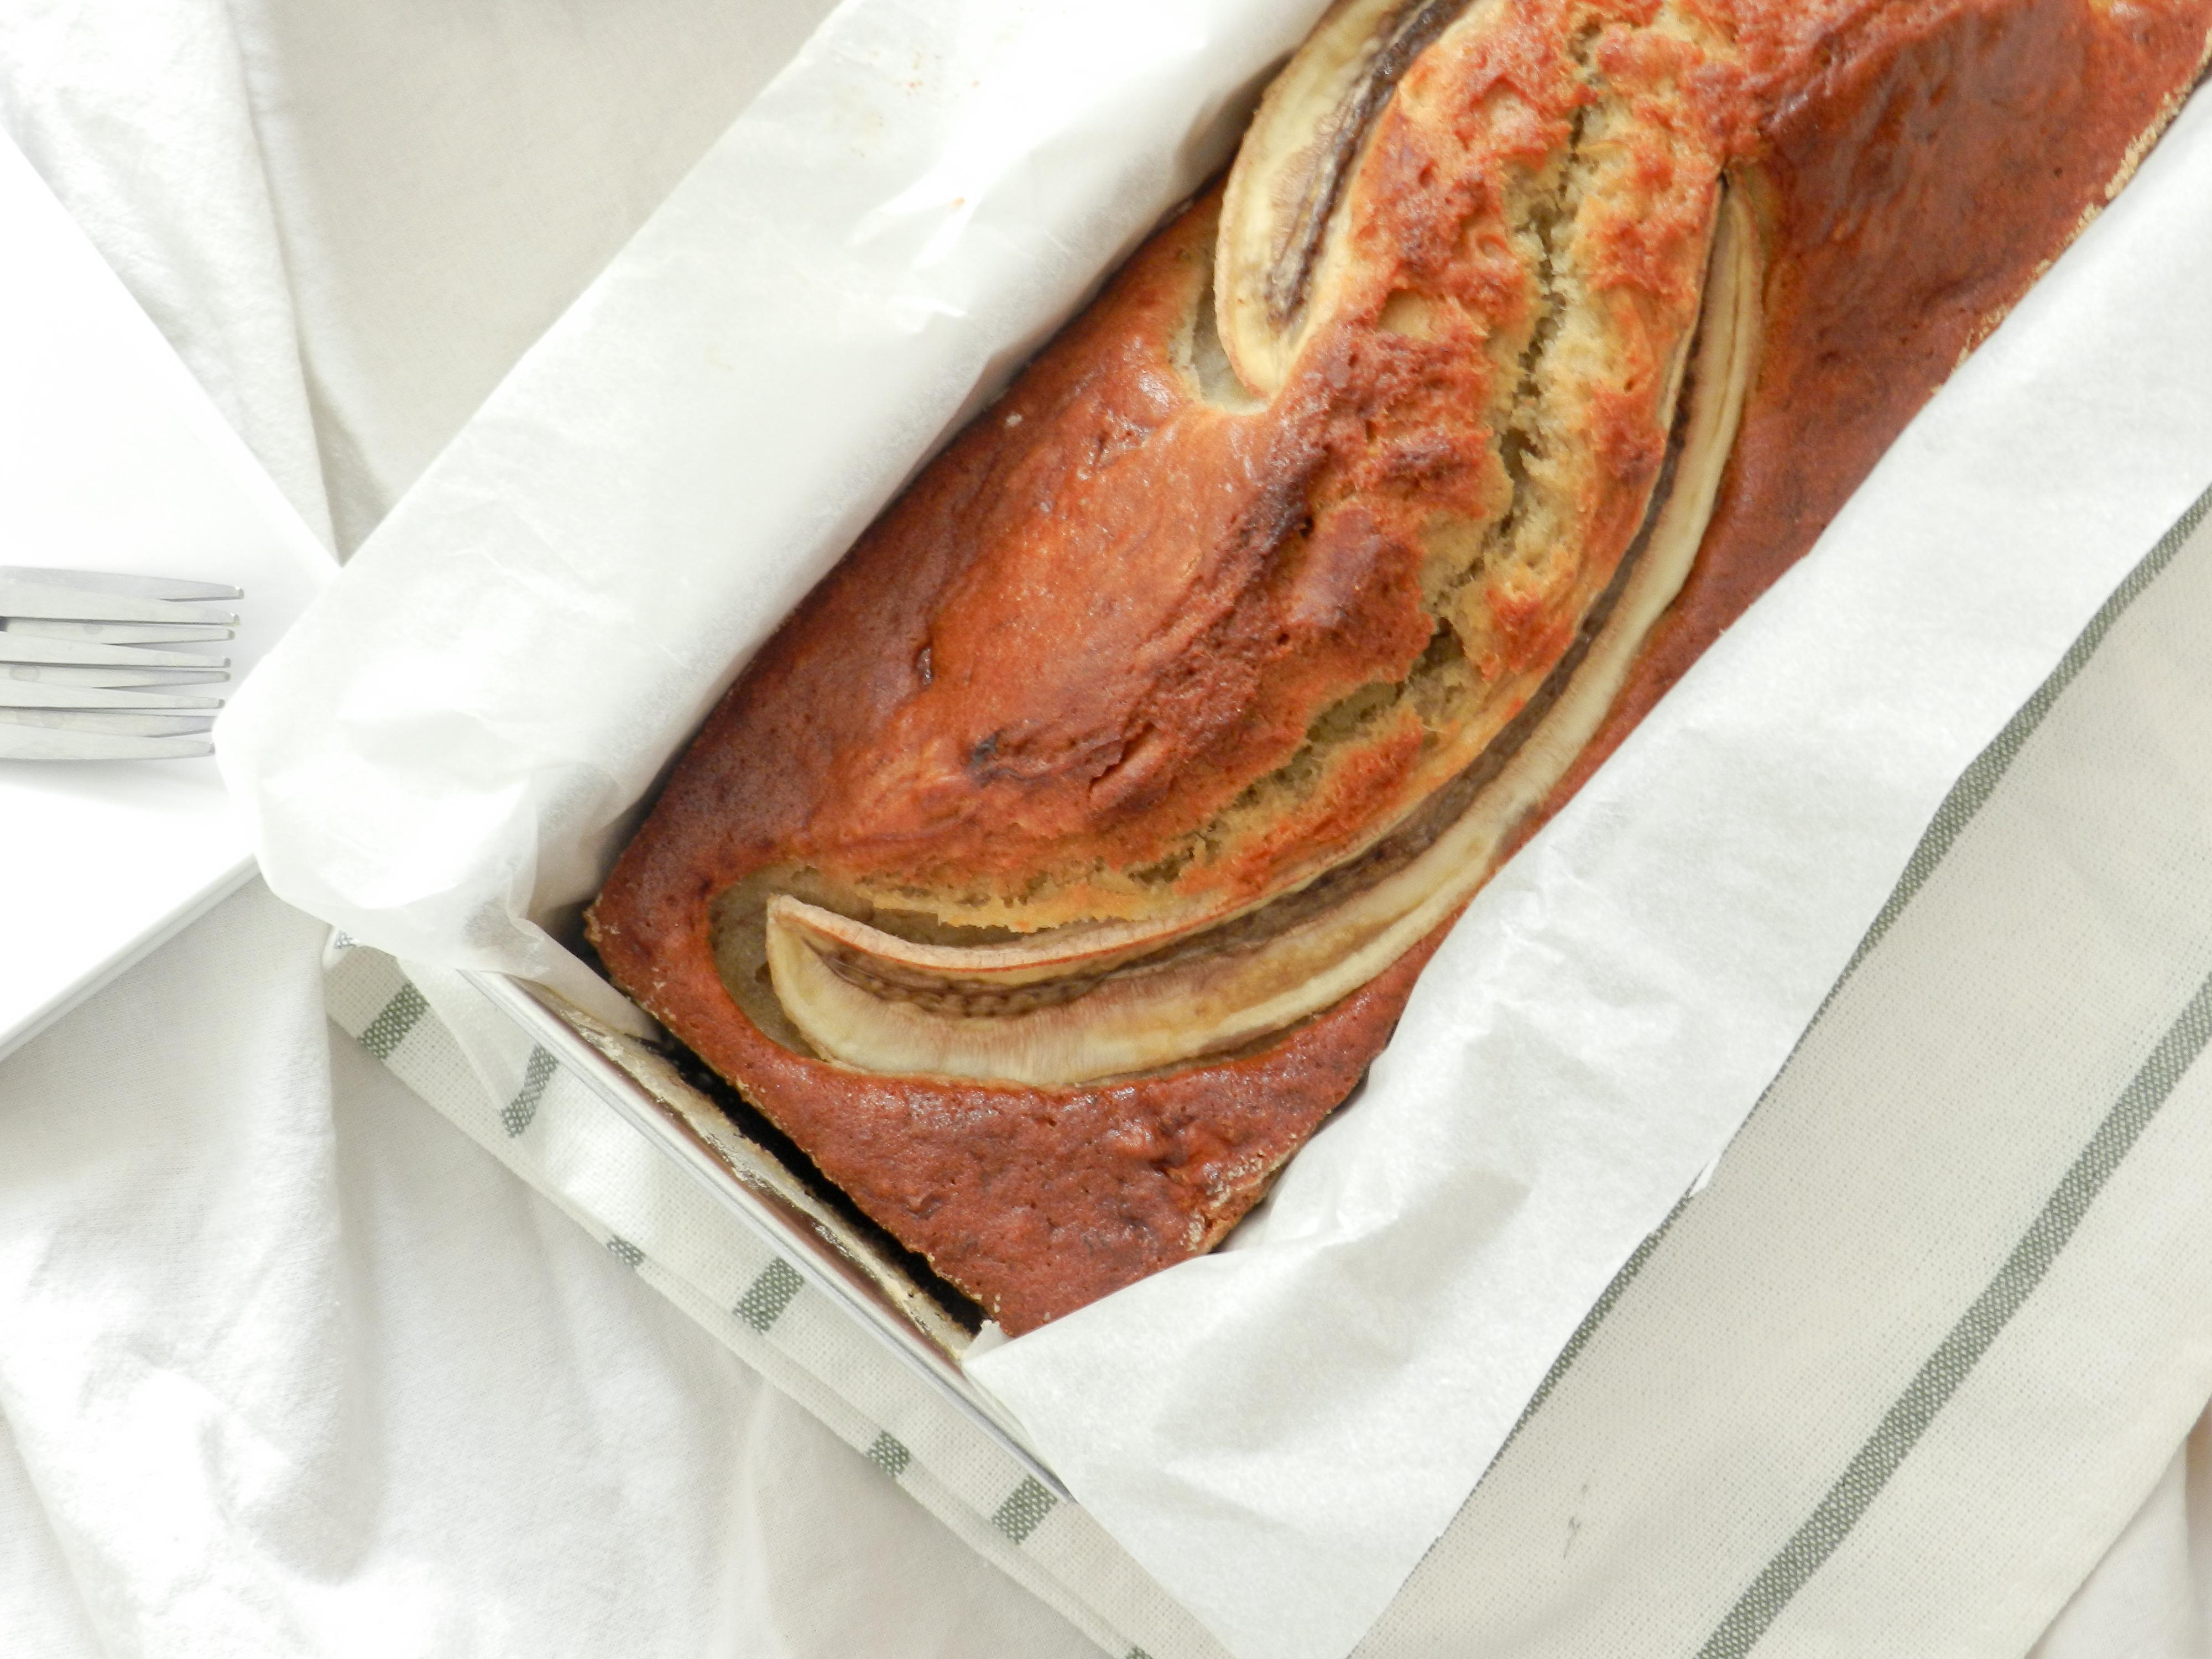 Banana bread à la vanille et au rhum - Wadji, Cooking mama